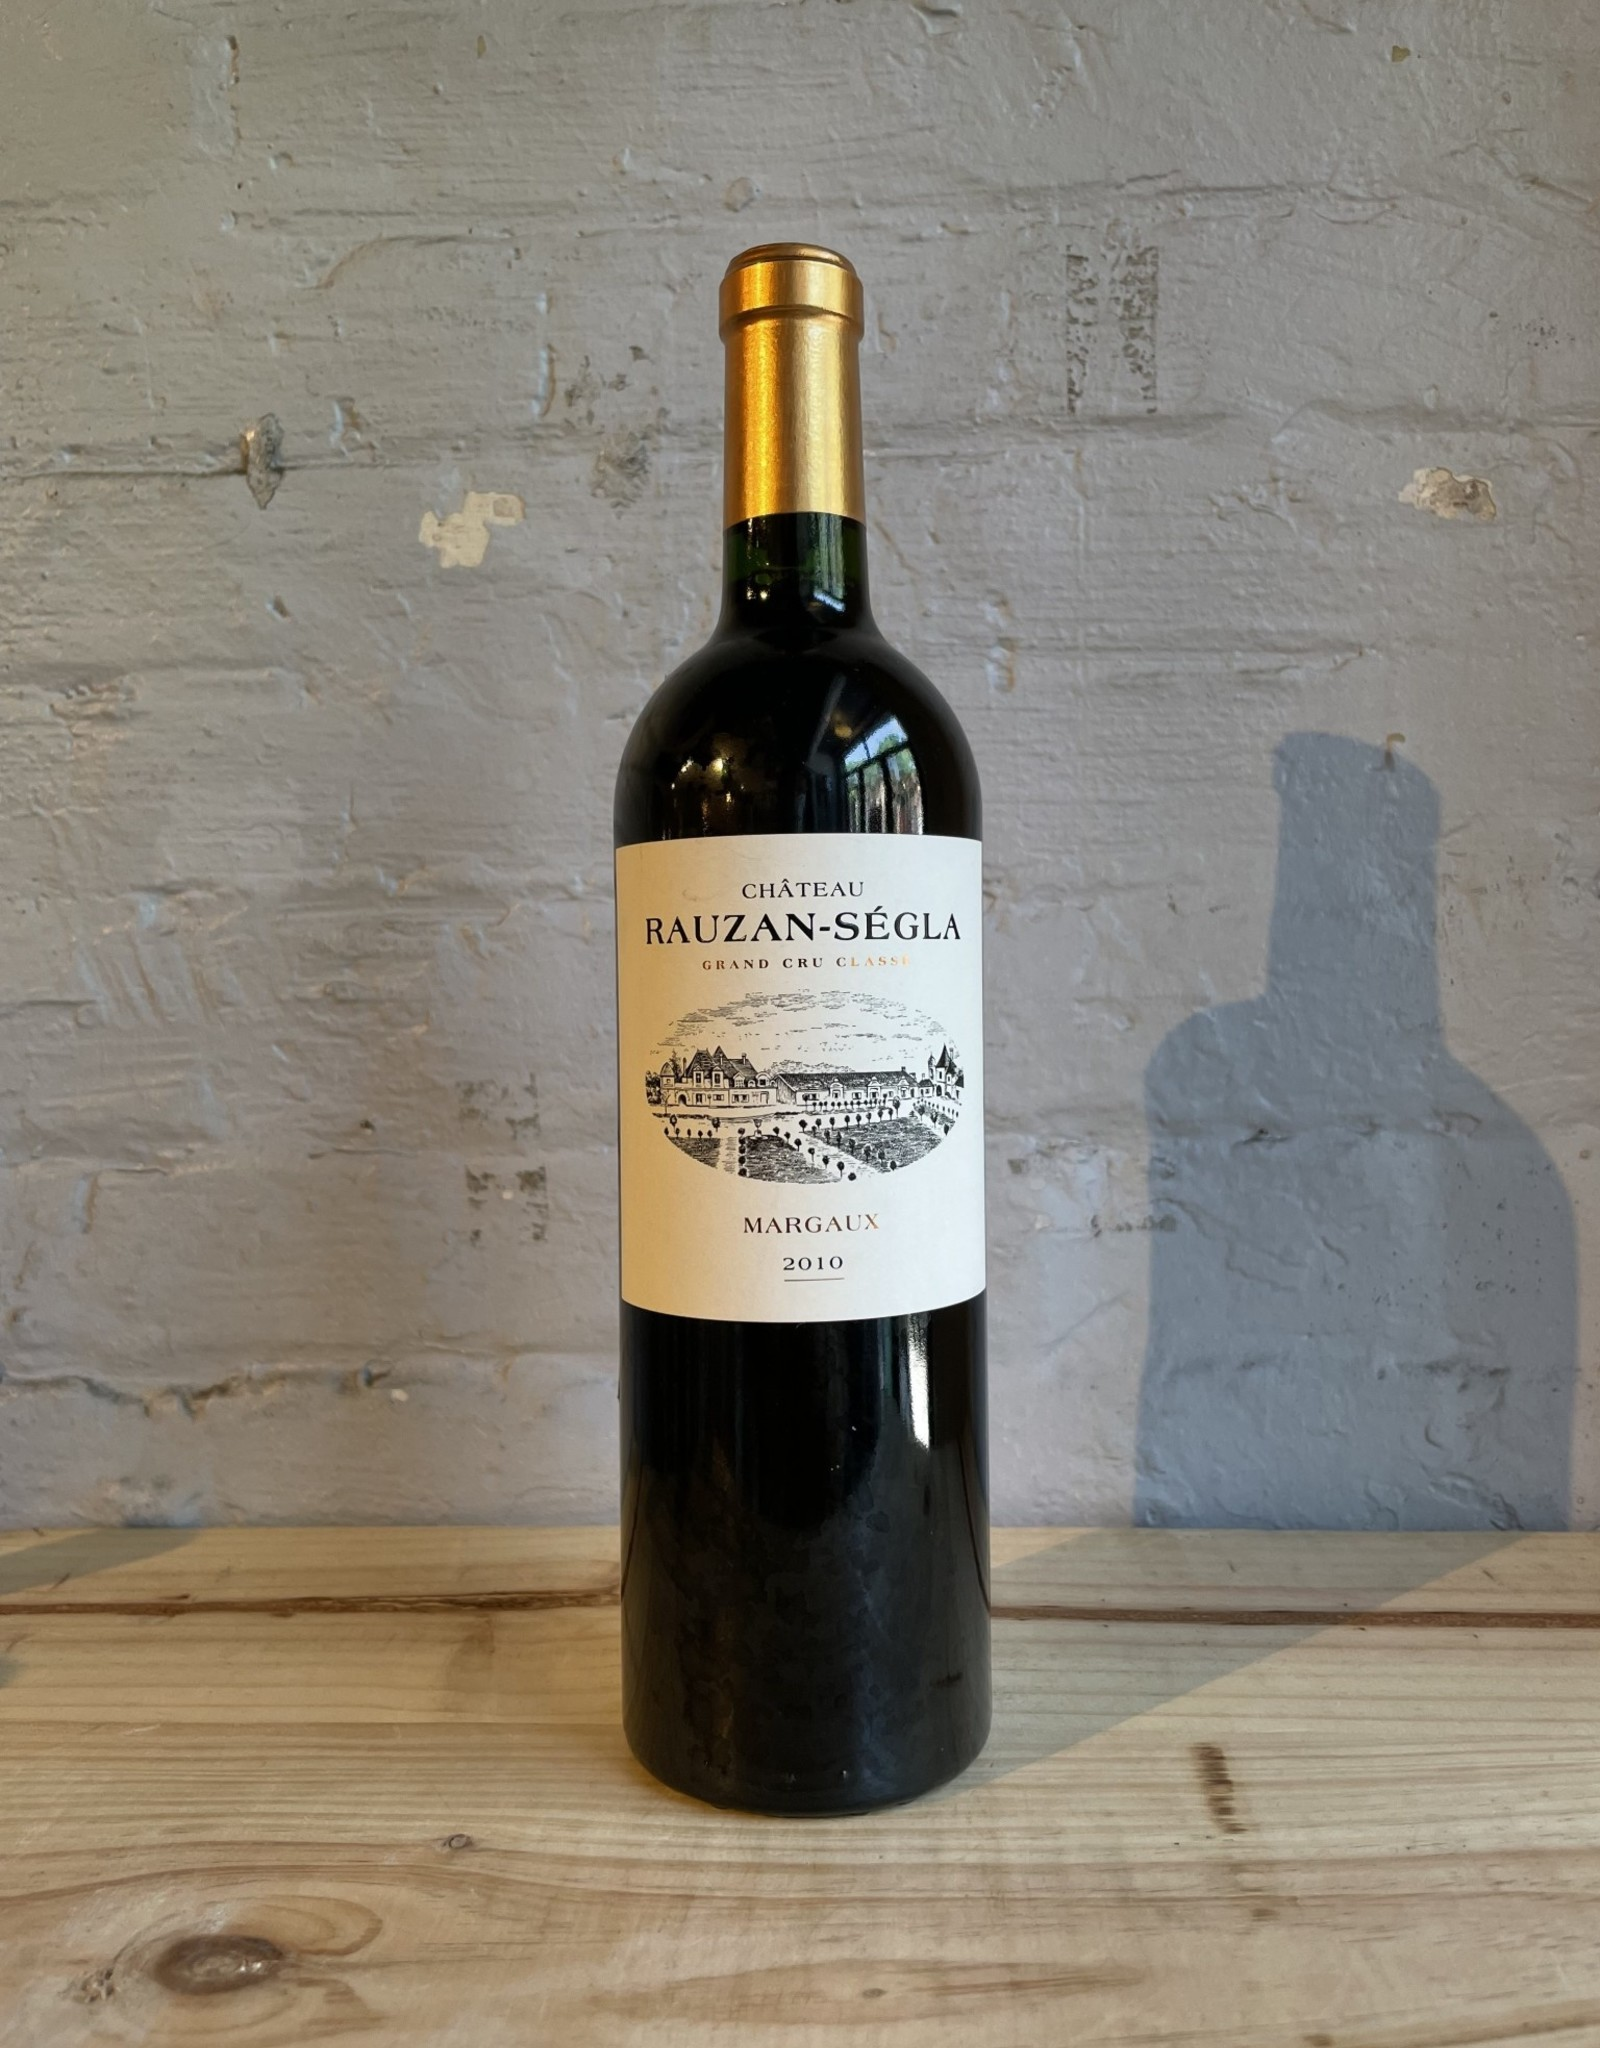 Wine 2010 Chateau Rauzan-Segla Margaux - Bordeaux, France (750ml)